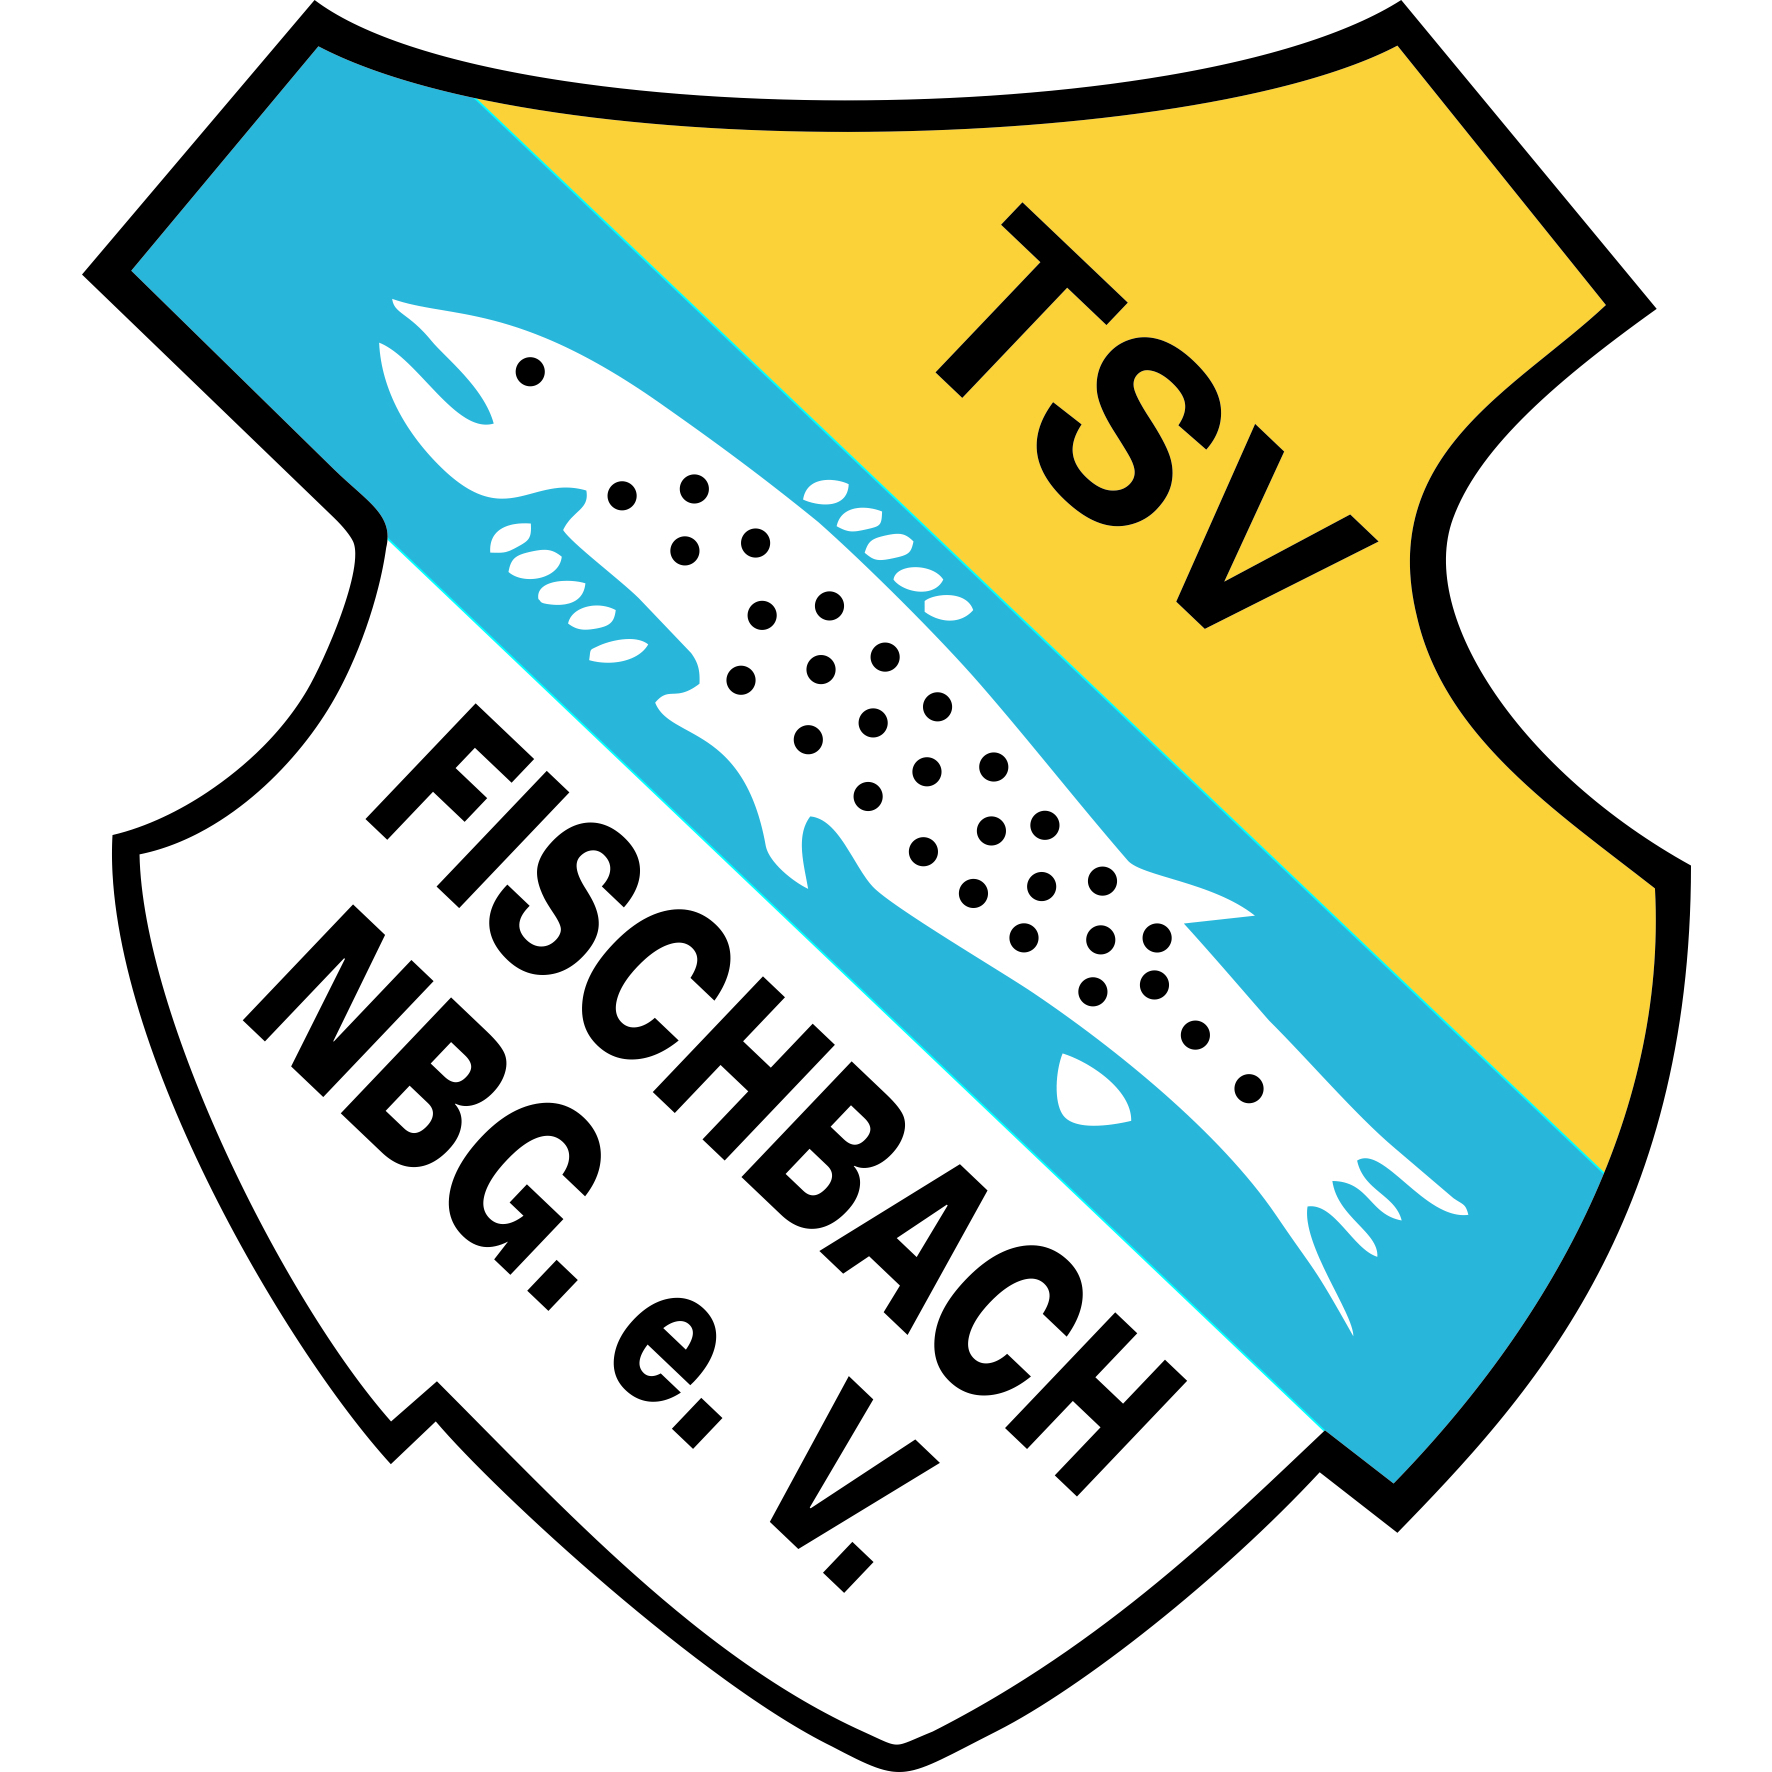 Tsv Fischbach